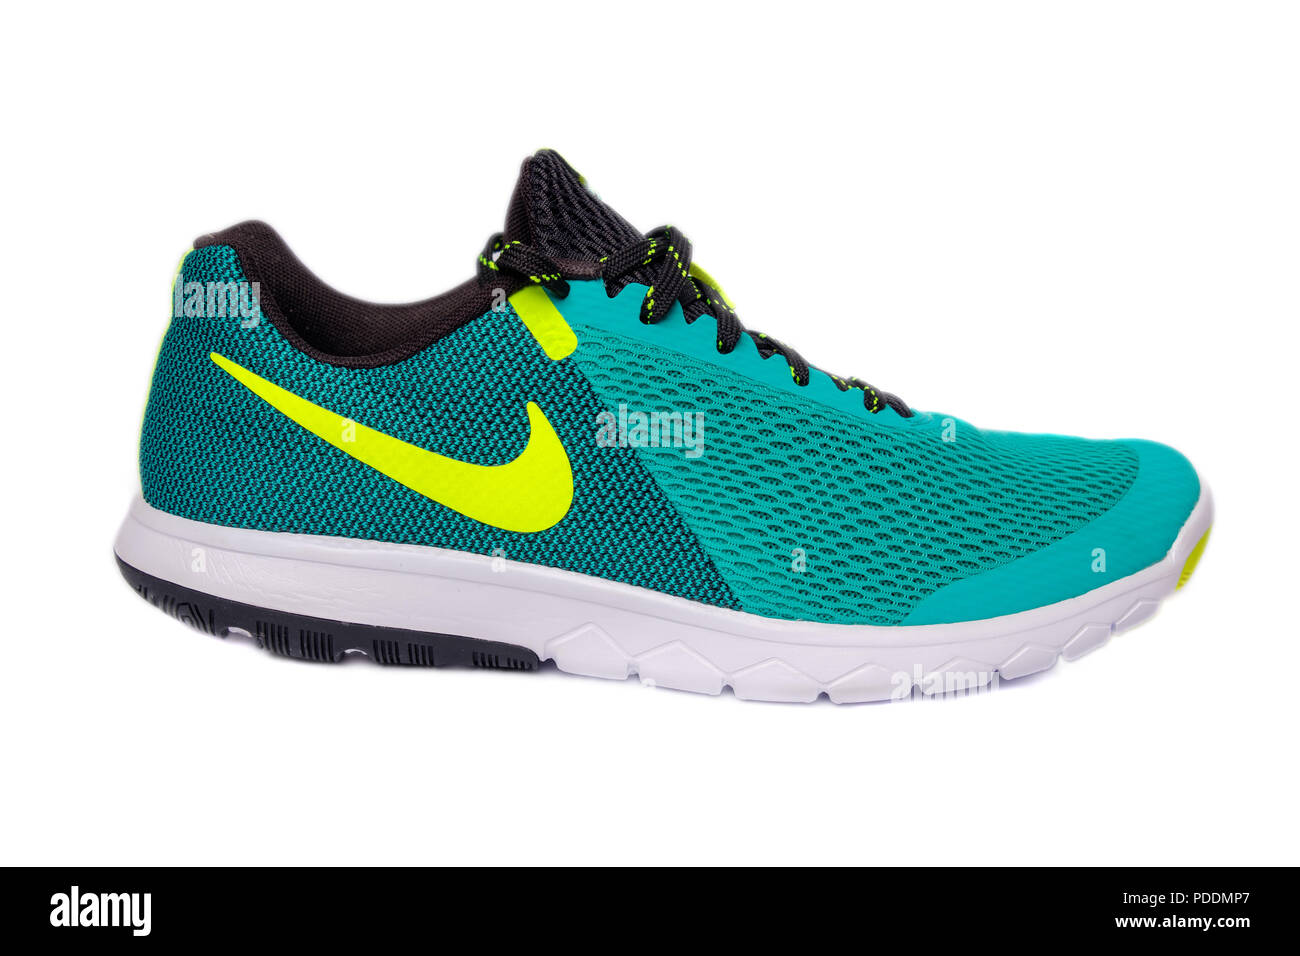 Nike verde Flex experiencia RN 5 Running Shoe recorte